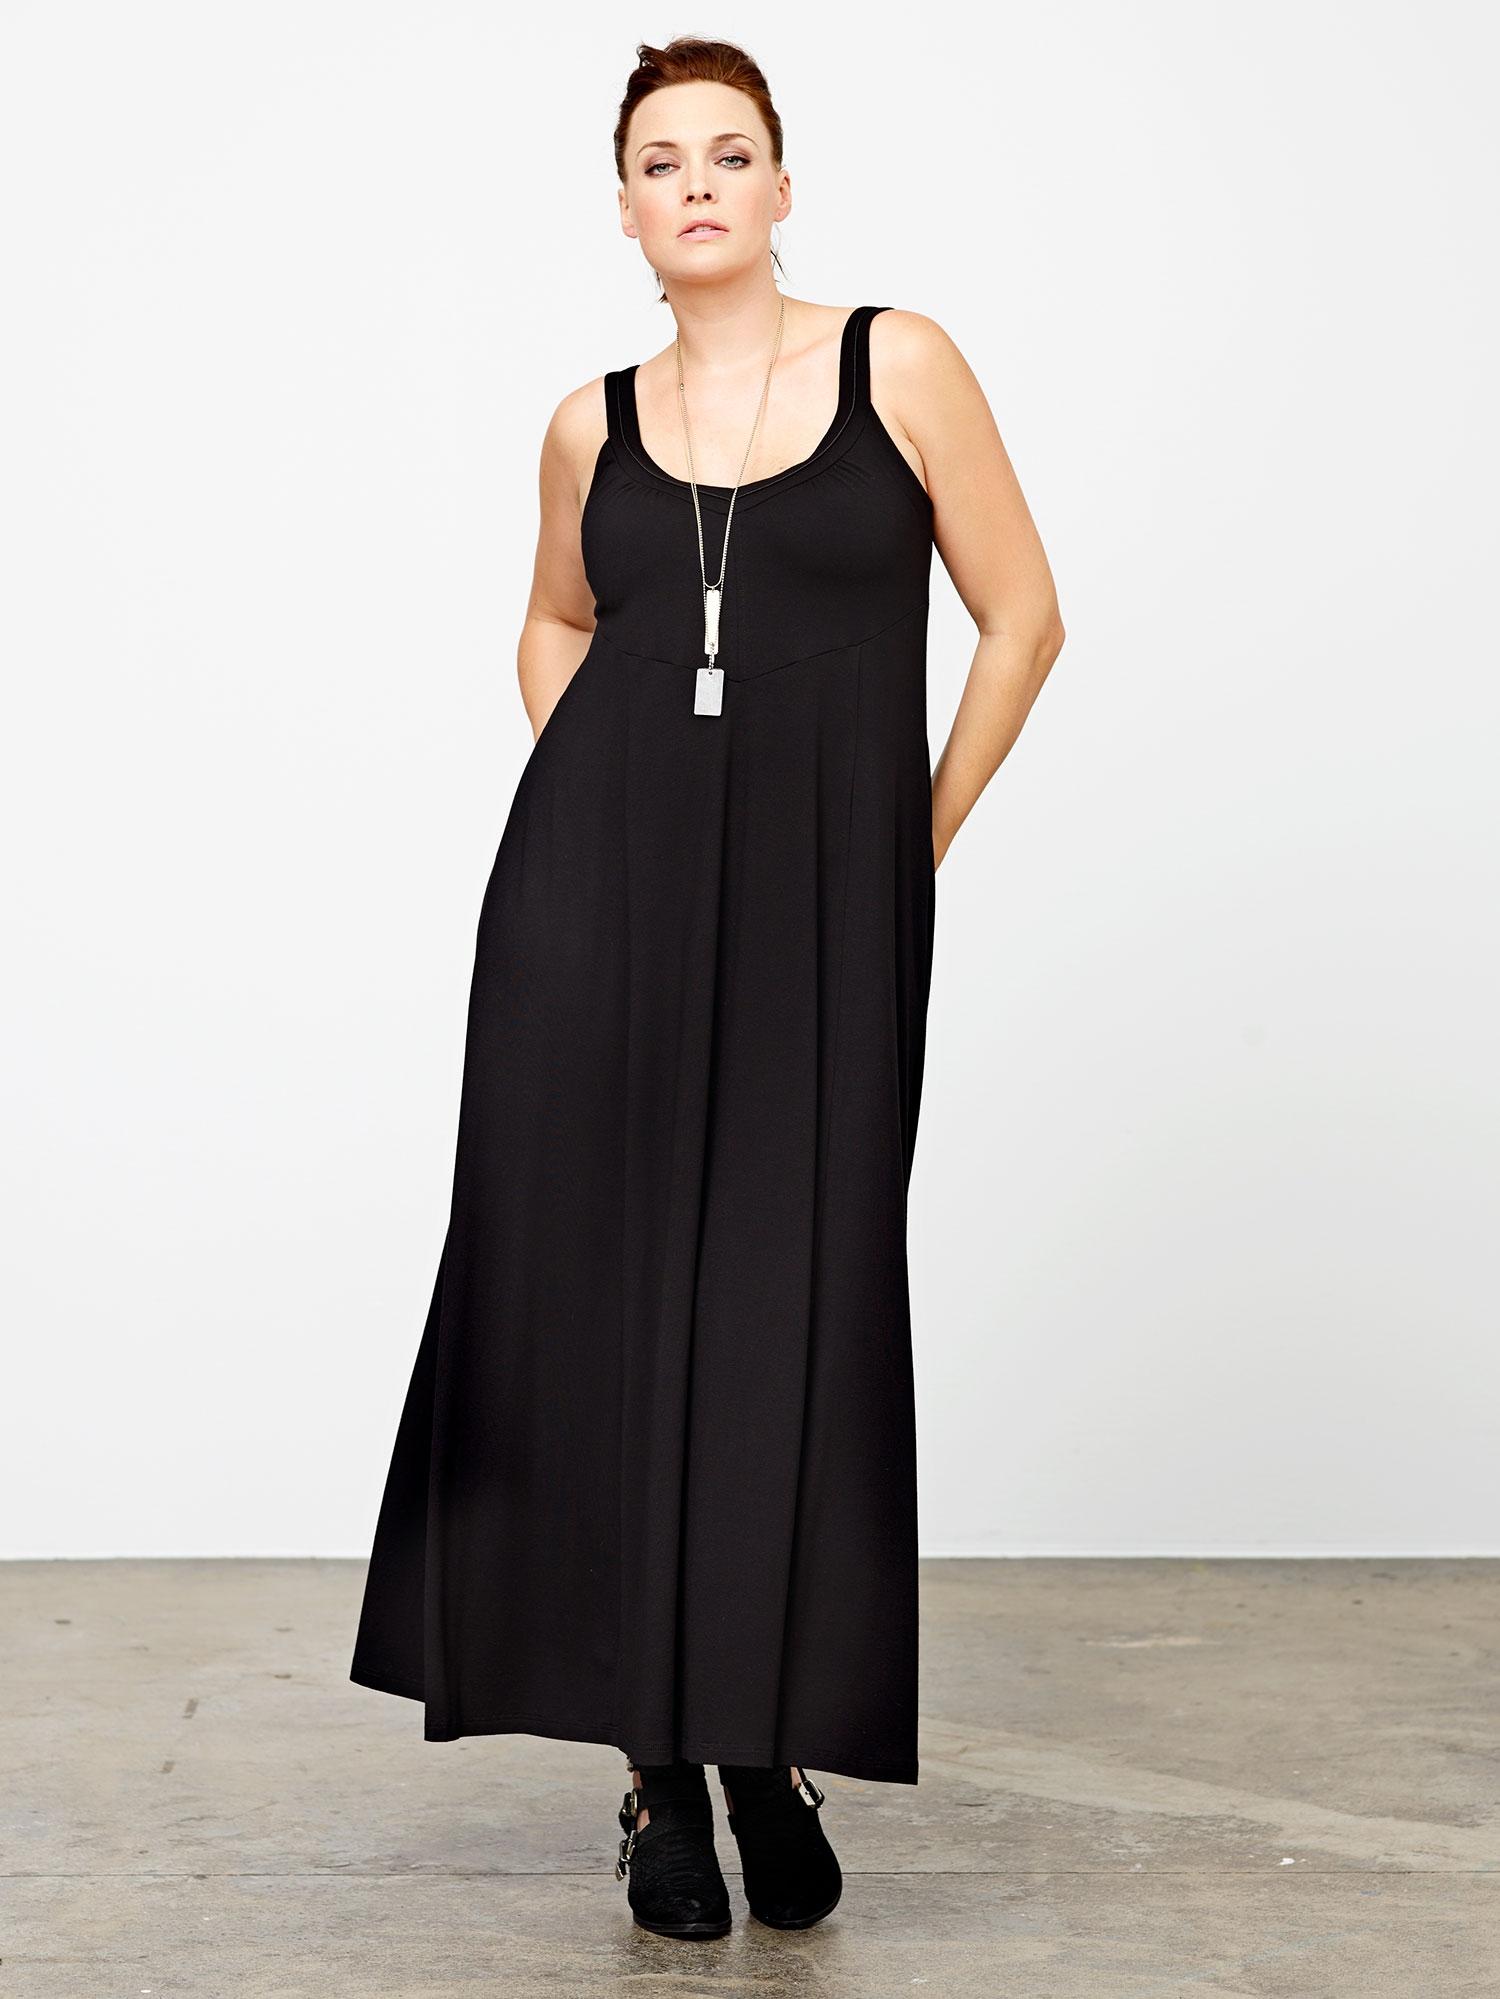 Lang sort kjole i viskosejersey, 42